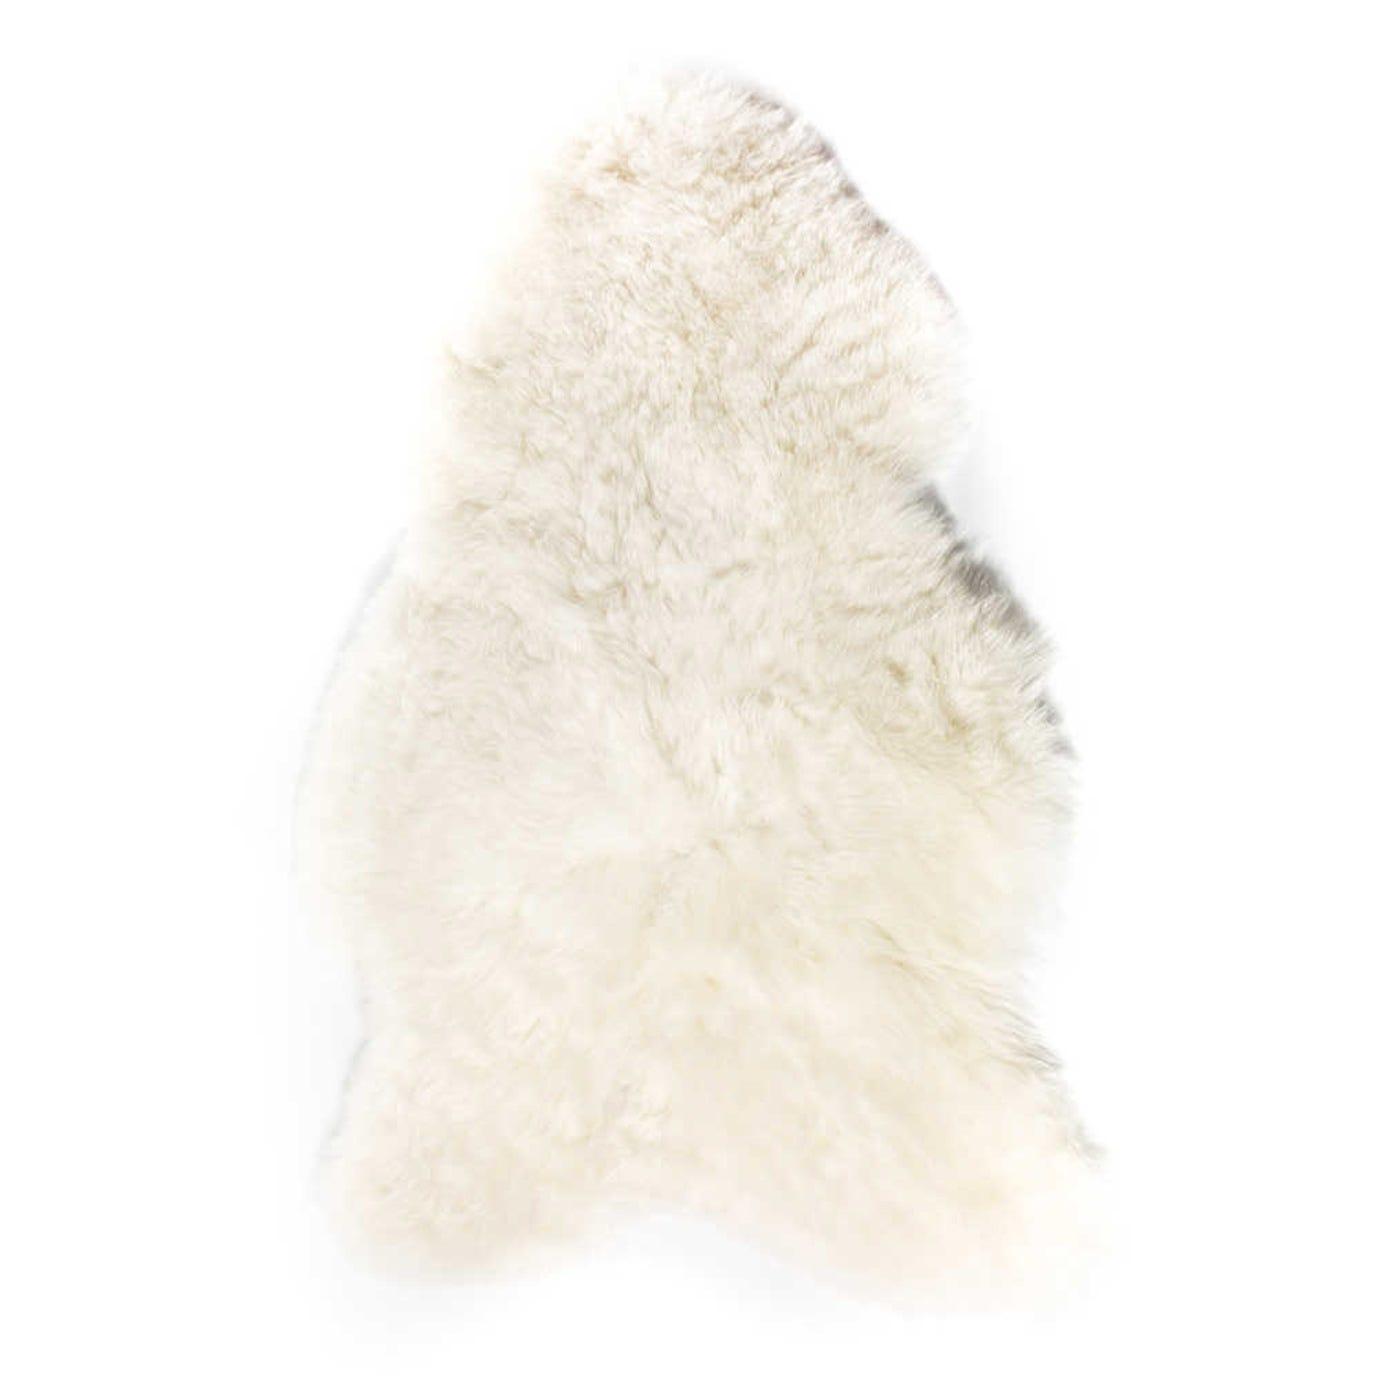 Icelandic Sheepskin Shorthaired Rug